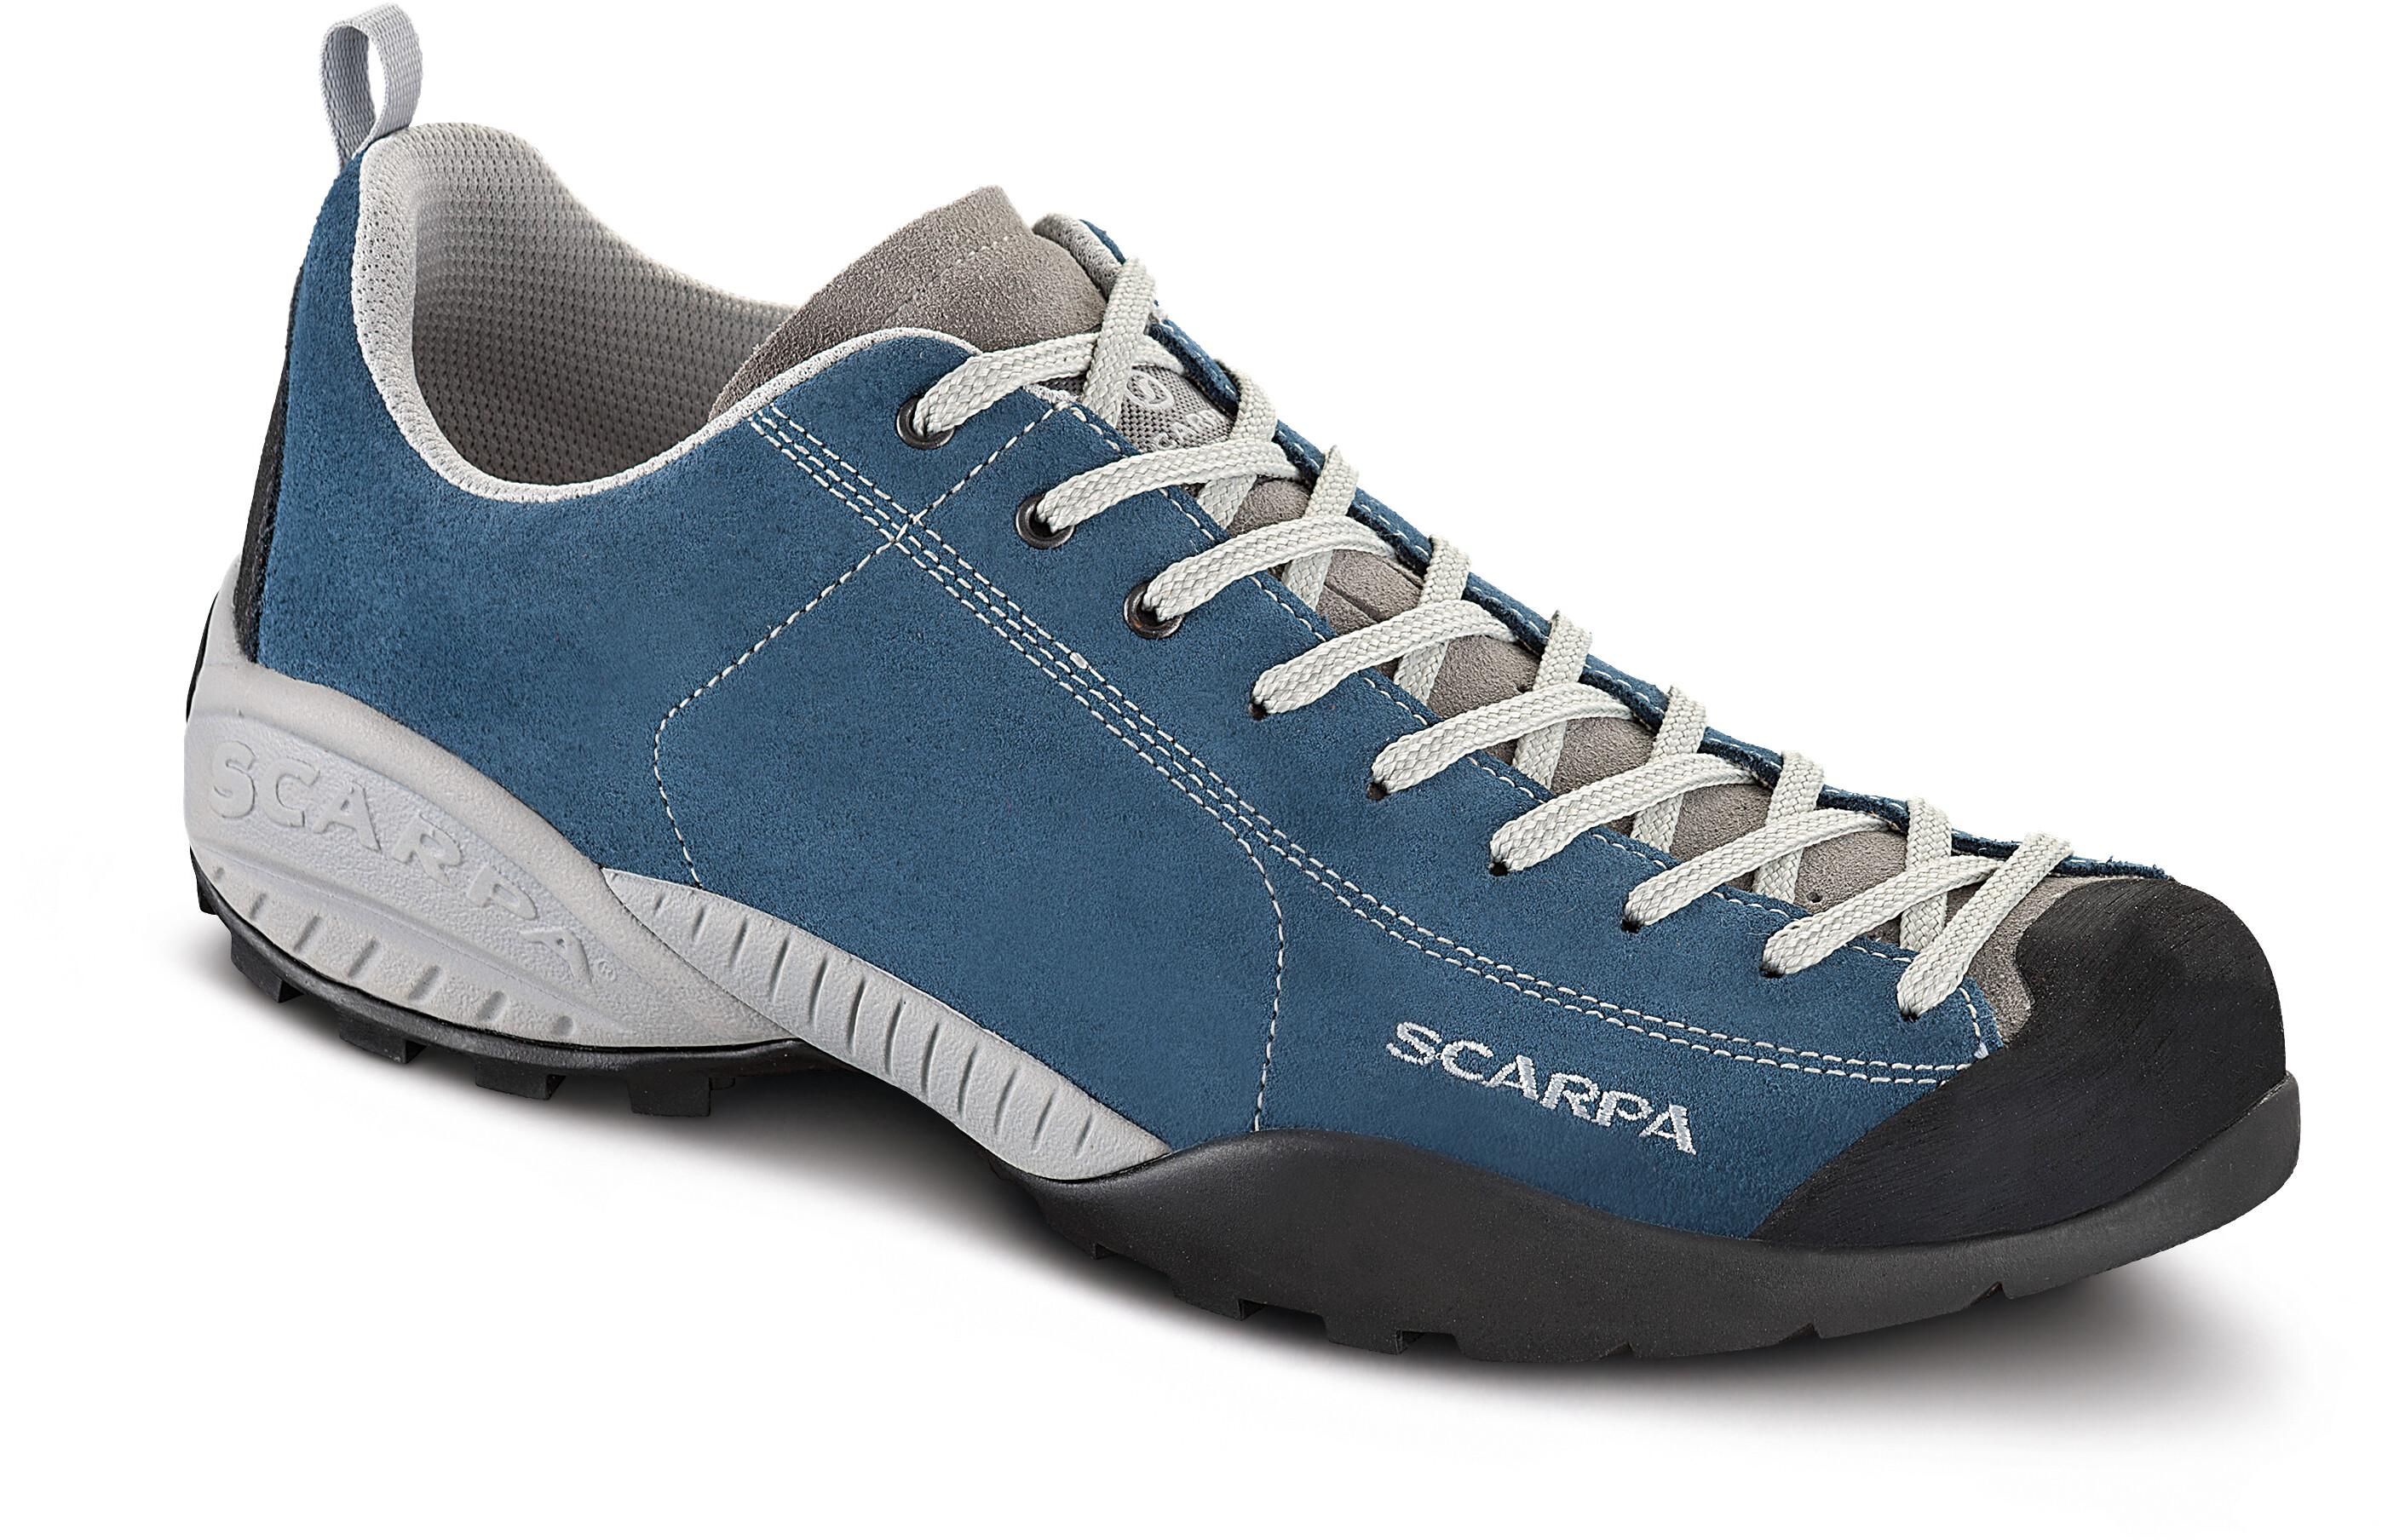 Scarpa Mojito Ocean Bleu outdoorschuhe Chaussures Loisirs Homme multi sport